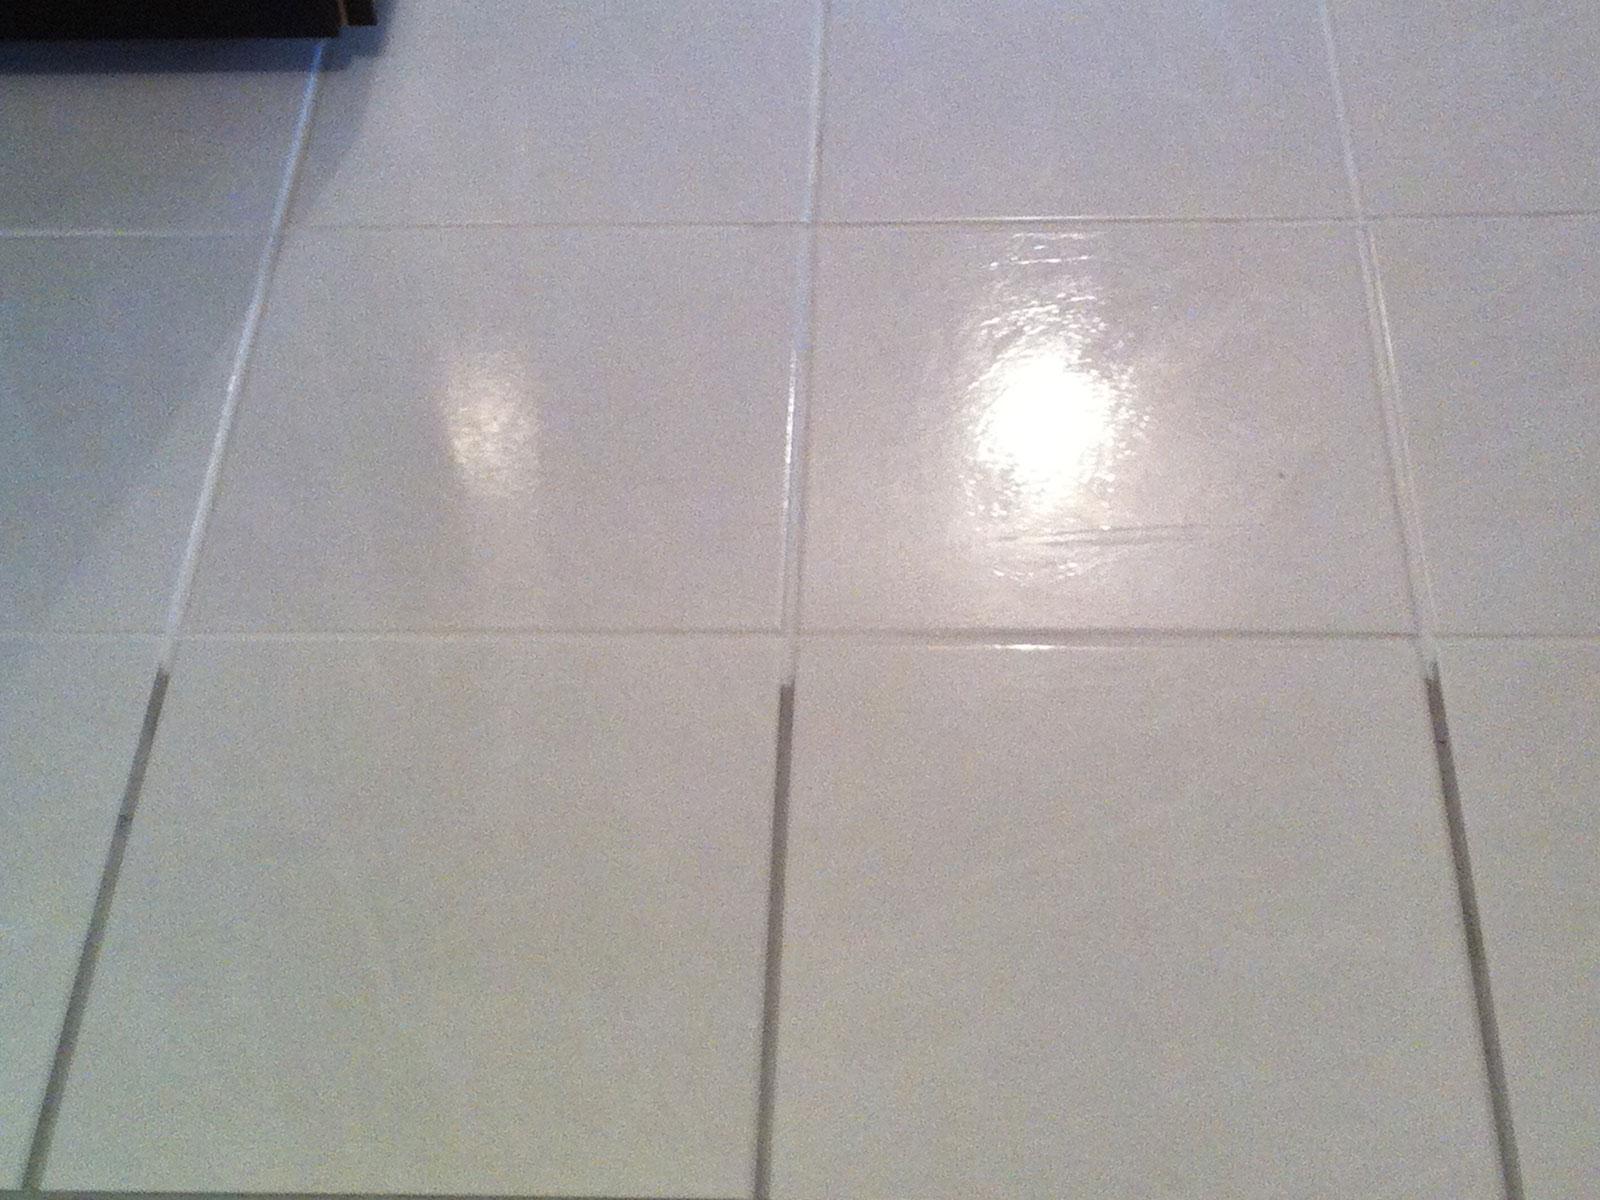 tile_cleaning_progress